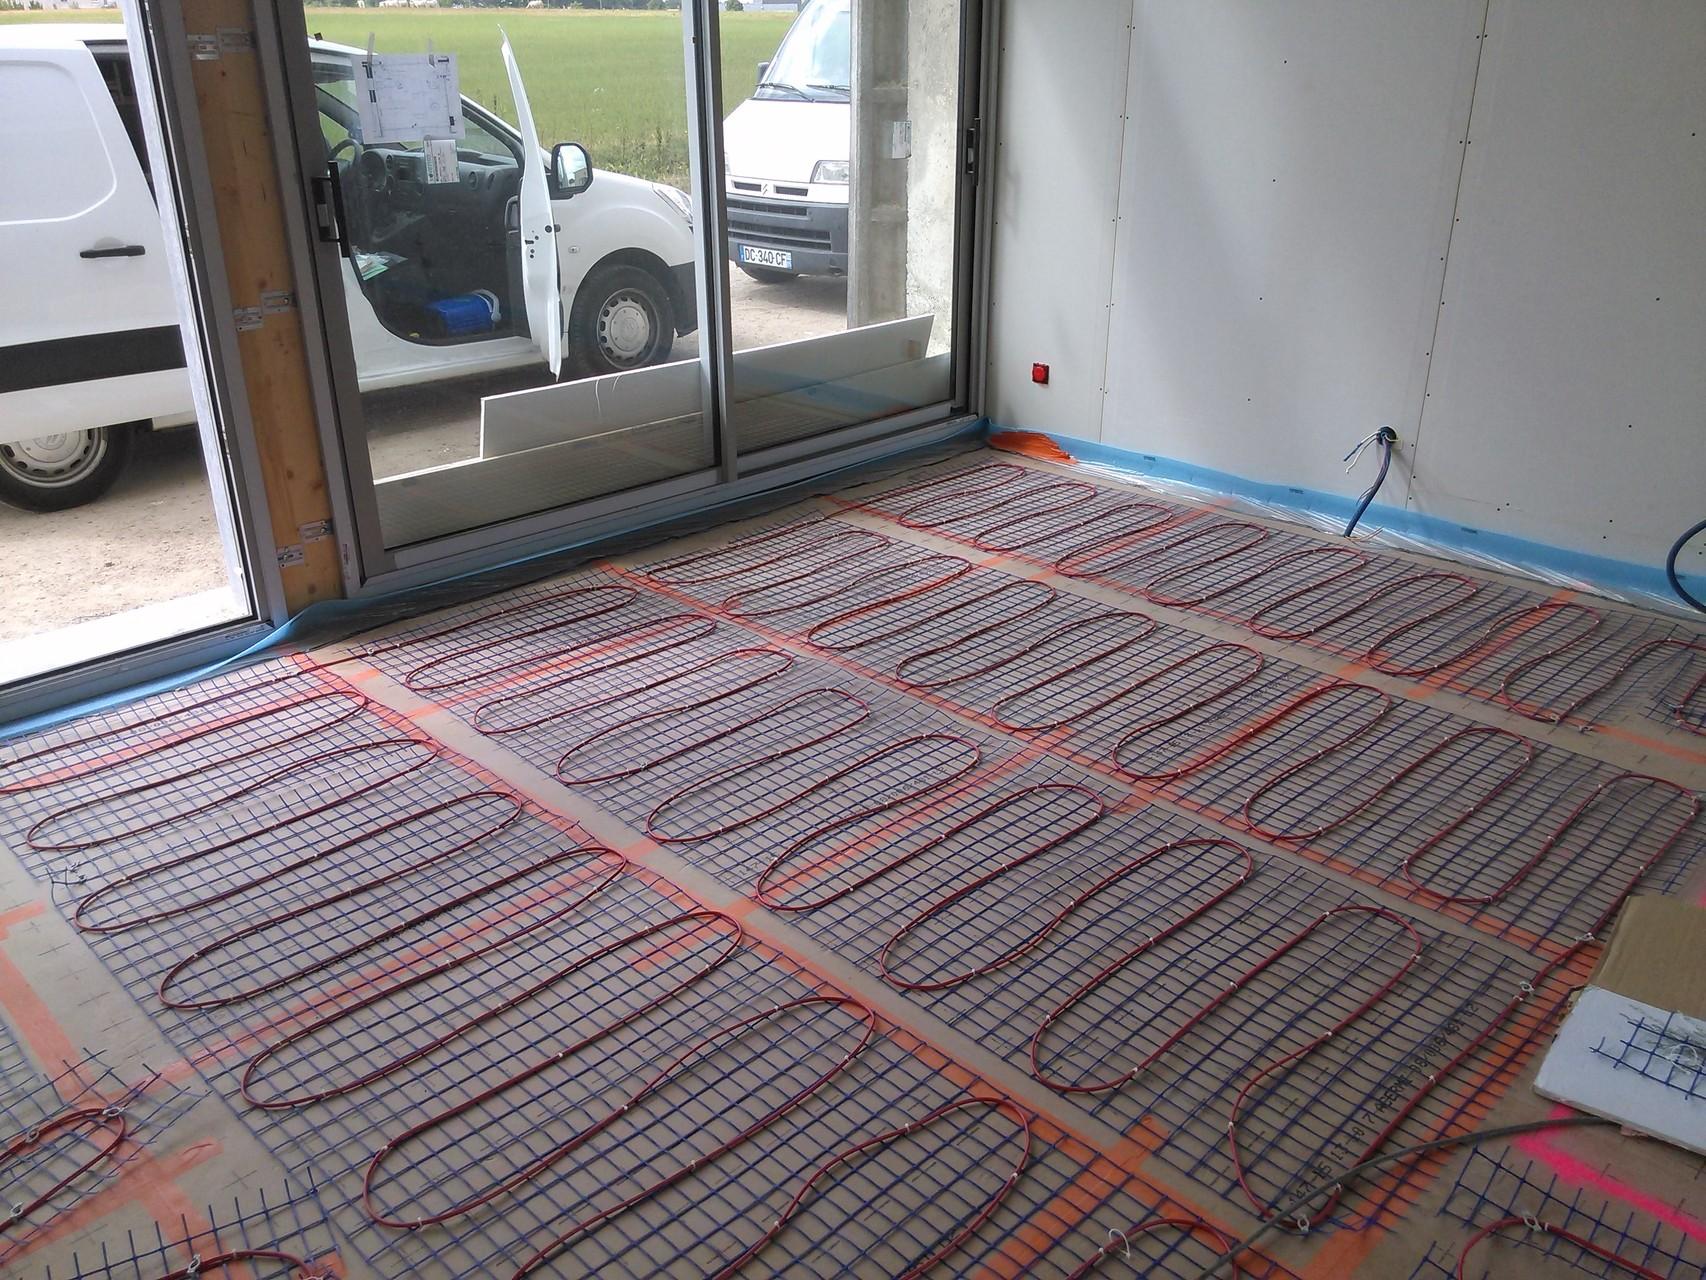 chauffage ventilation lectricit g n rale guinehut. Black Bedroom Furniture Sets. Home Design Ideas